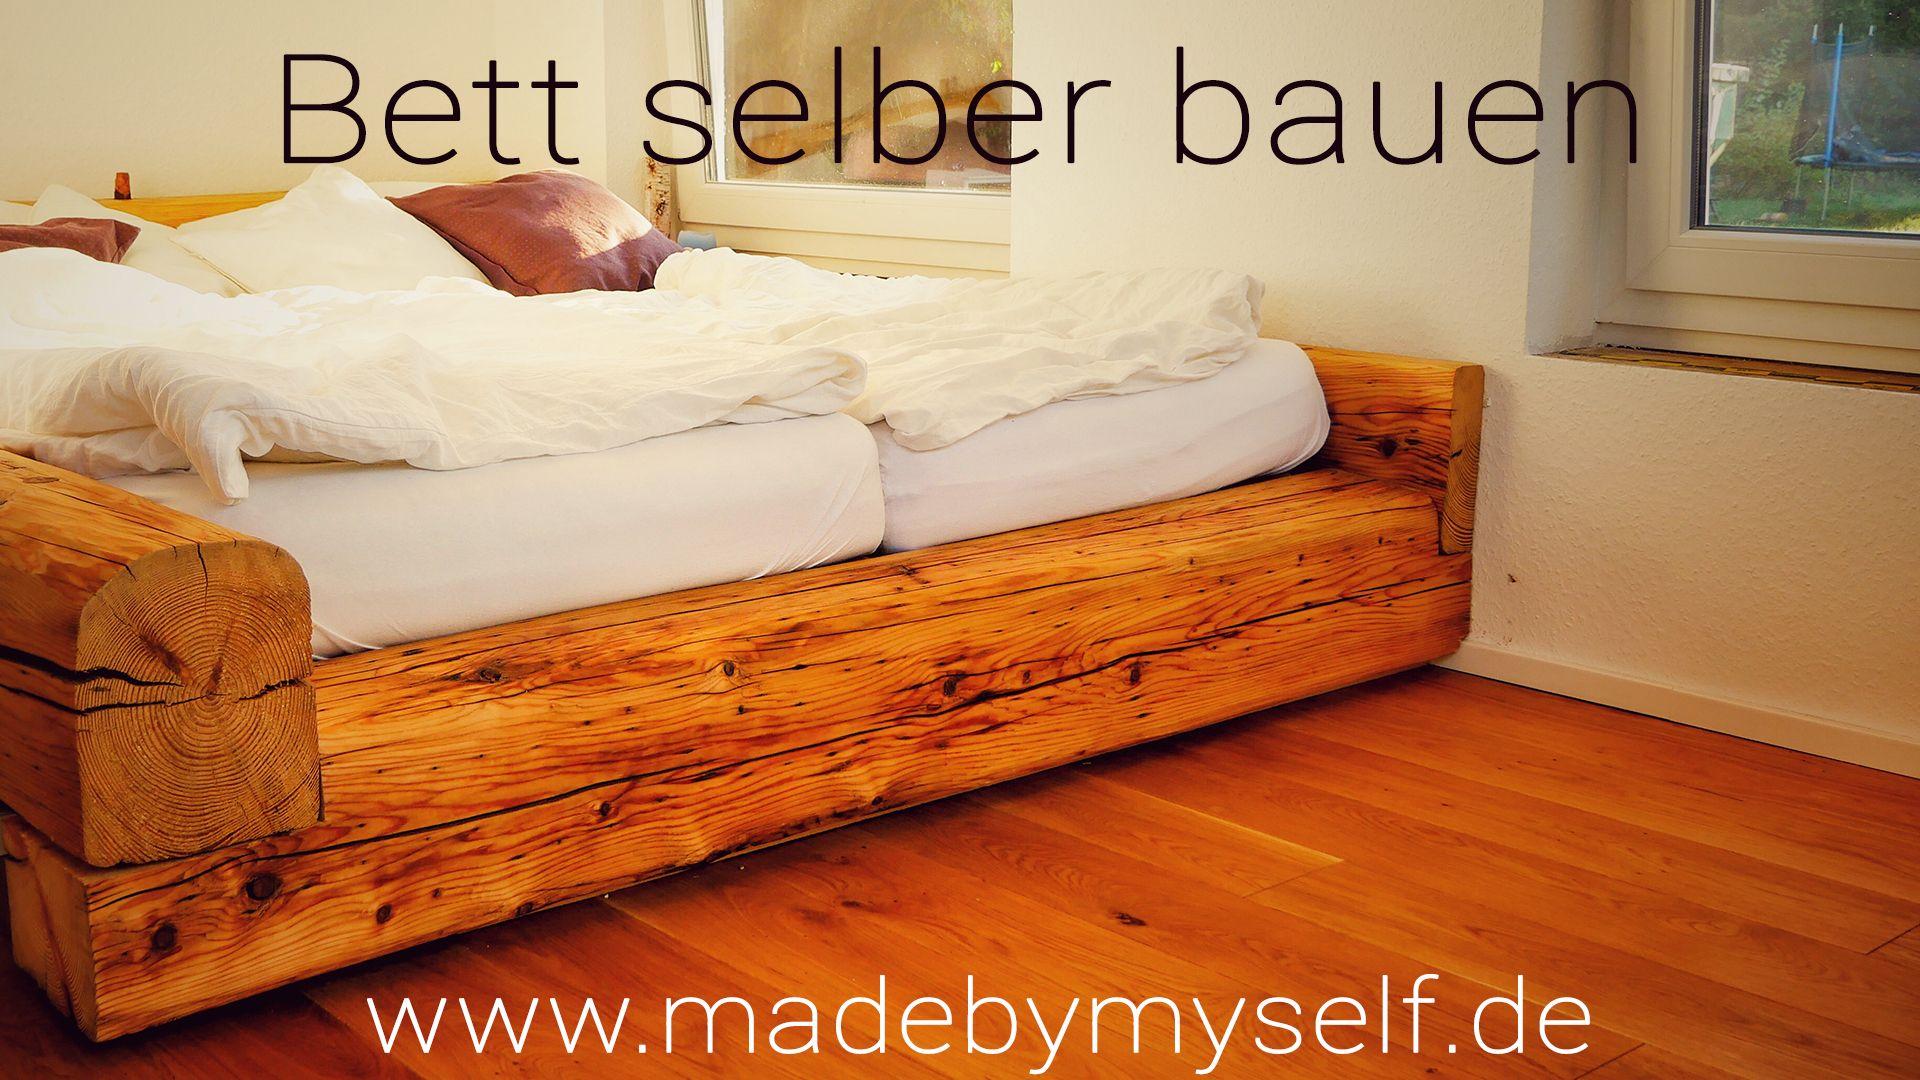 Balkenbett Bett Selber Bauen Bett Selber Bauen Bett Selber